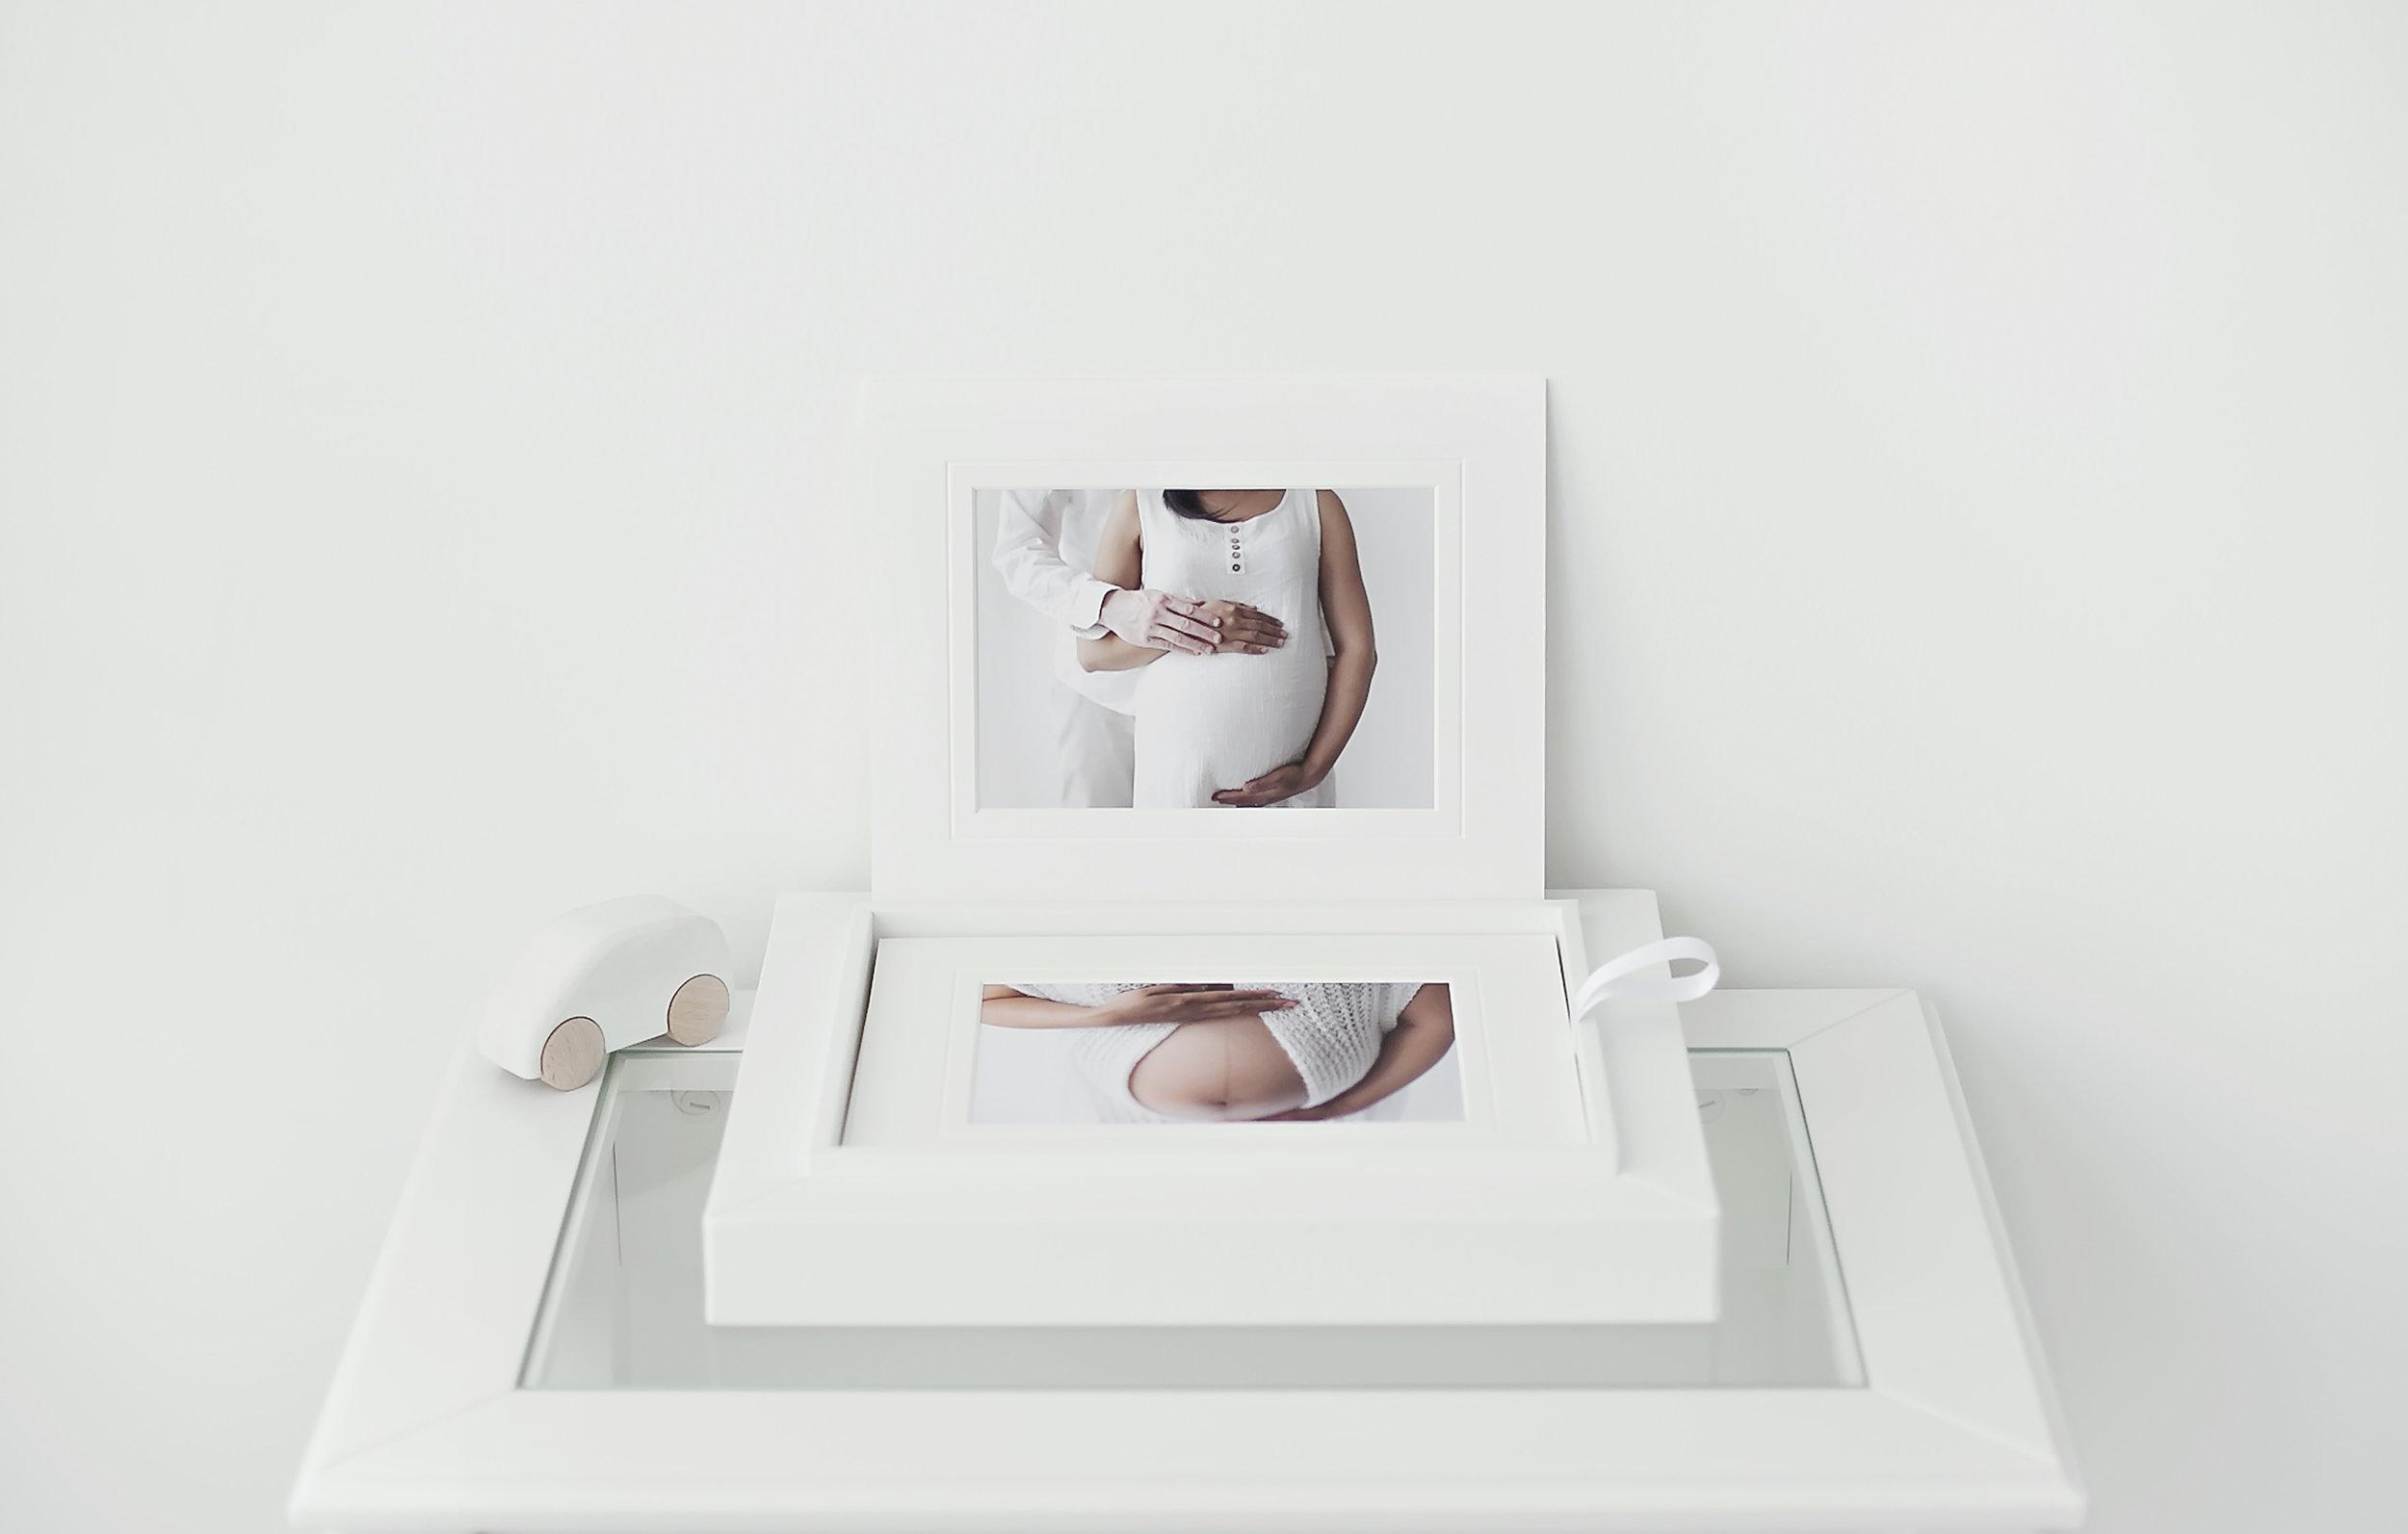 Toronto_Vaughan_FIneArt_Product_RevealBox_Petra_King_Photography